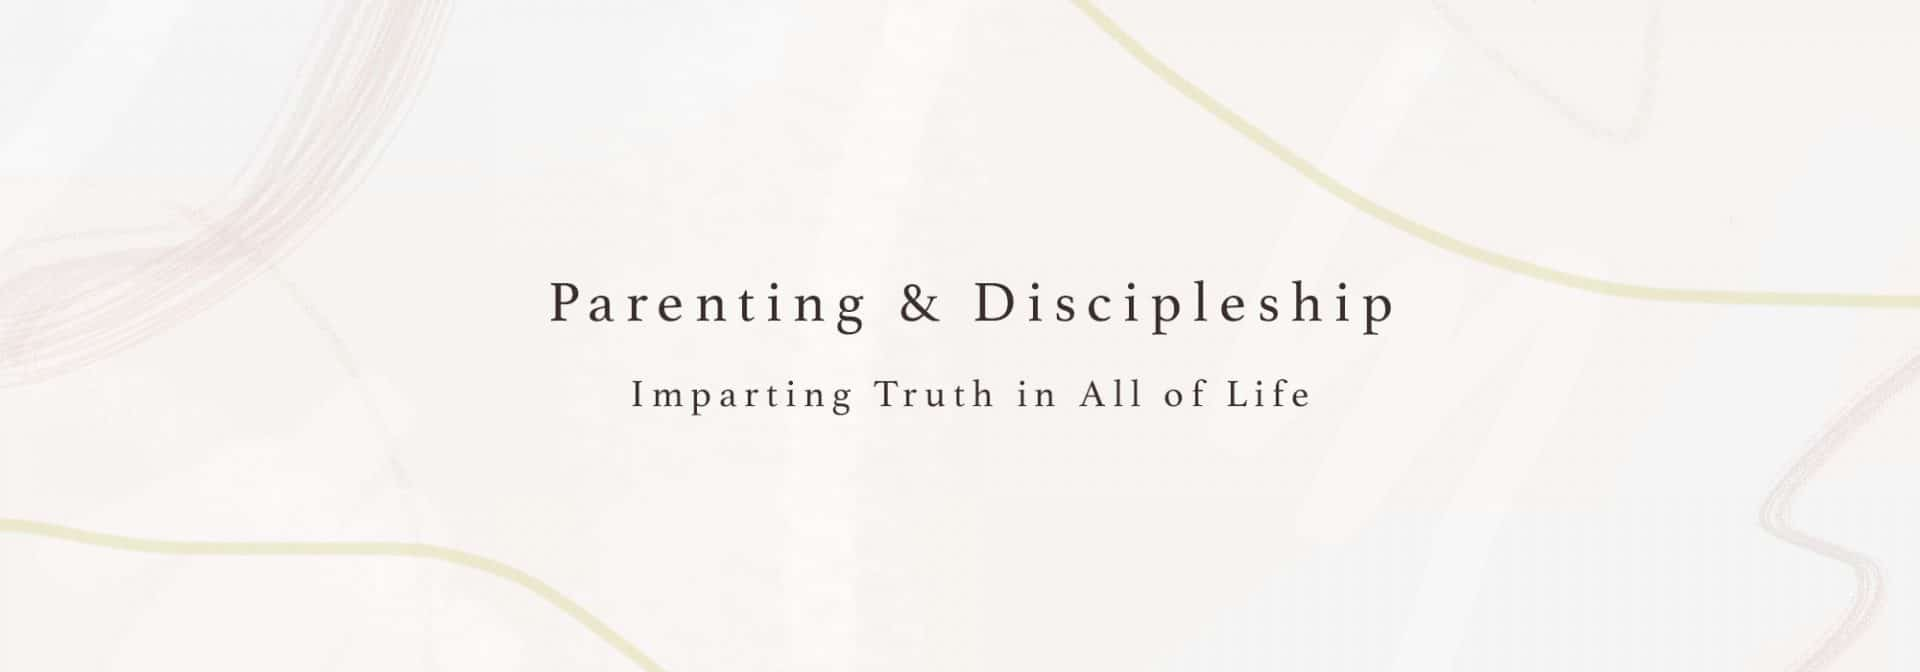 Identifying Three Dangerous Underlying Values in Parenting